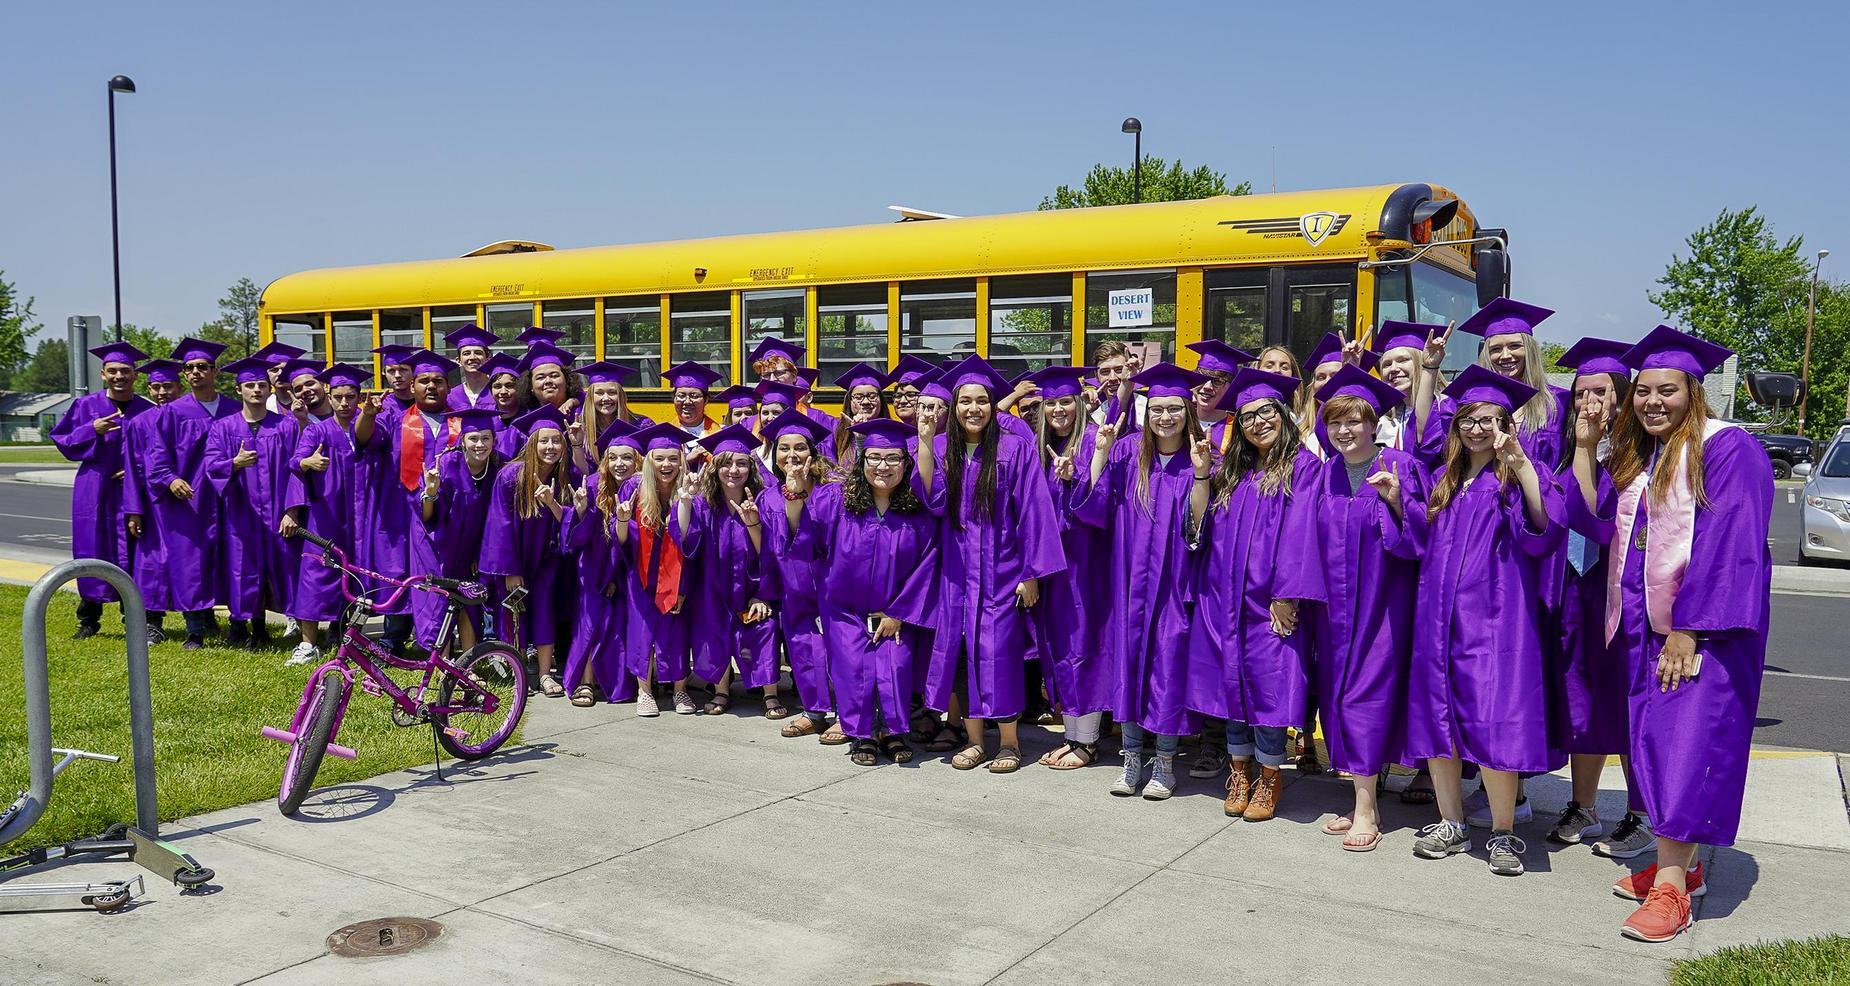 High school seniors visit their former elementary school.